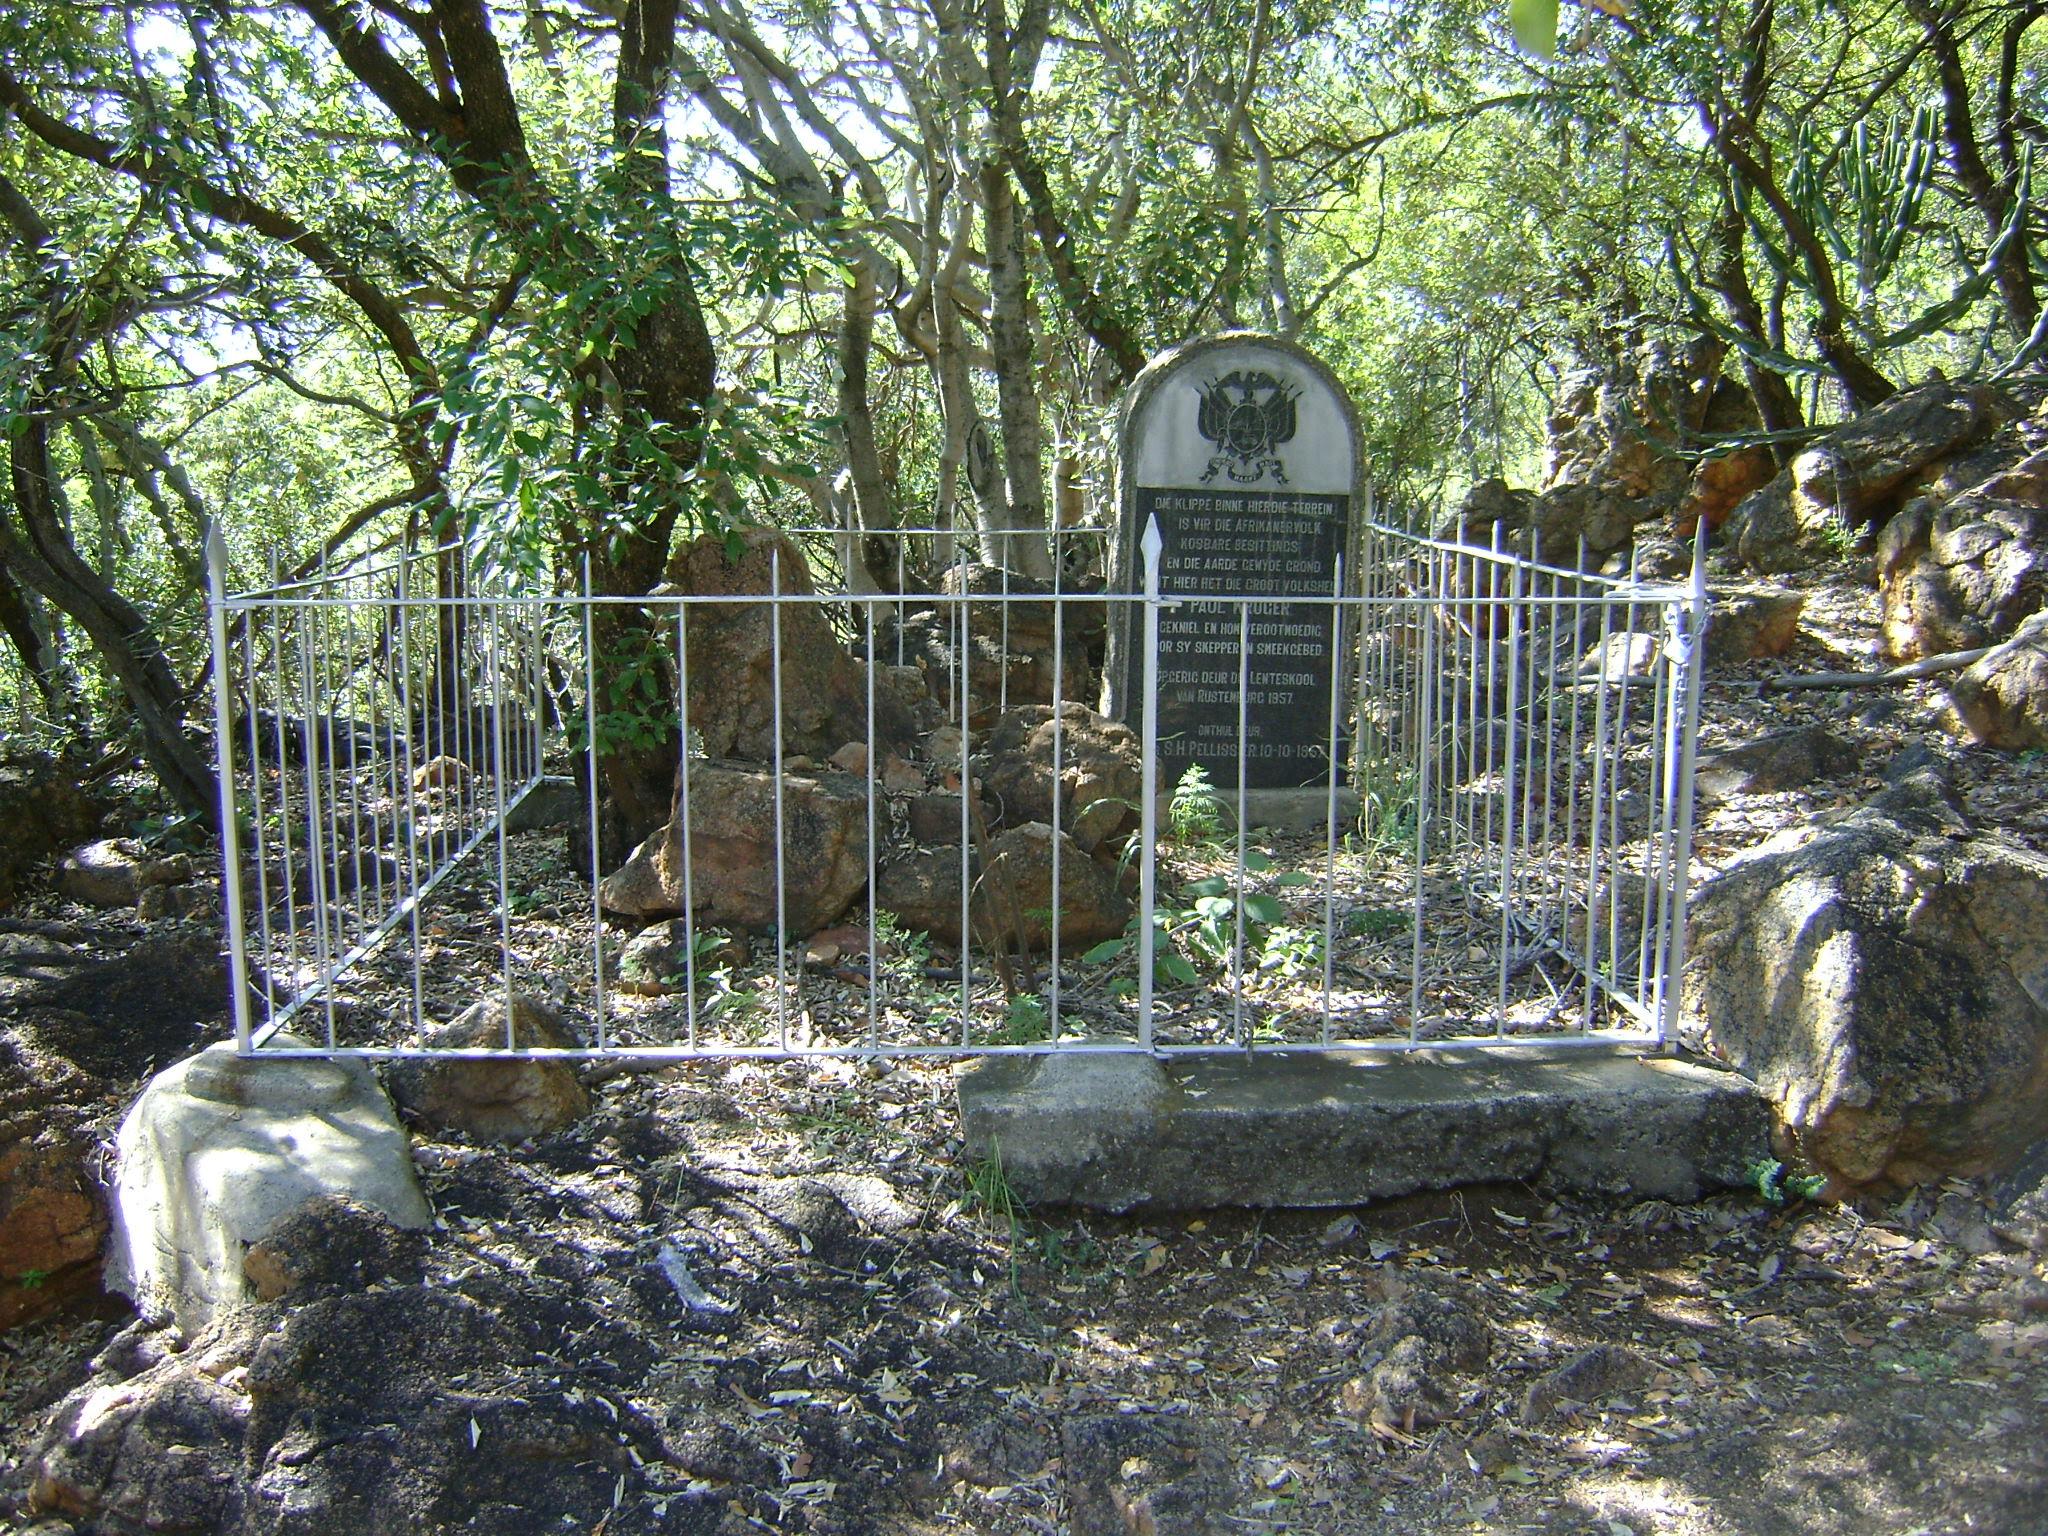 http://tuksarchaeology.files.wordpress.com/2012/04/boekenhoutfontein-716.jpg